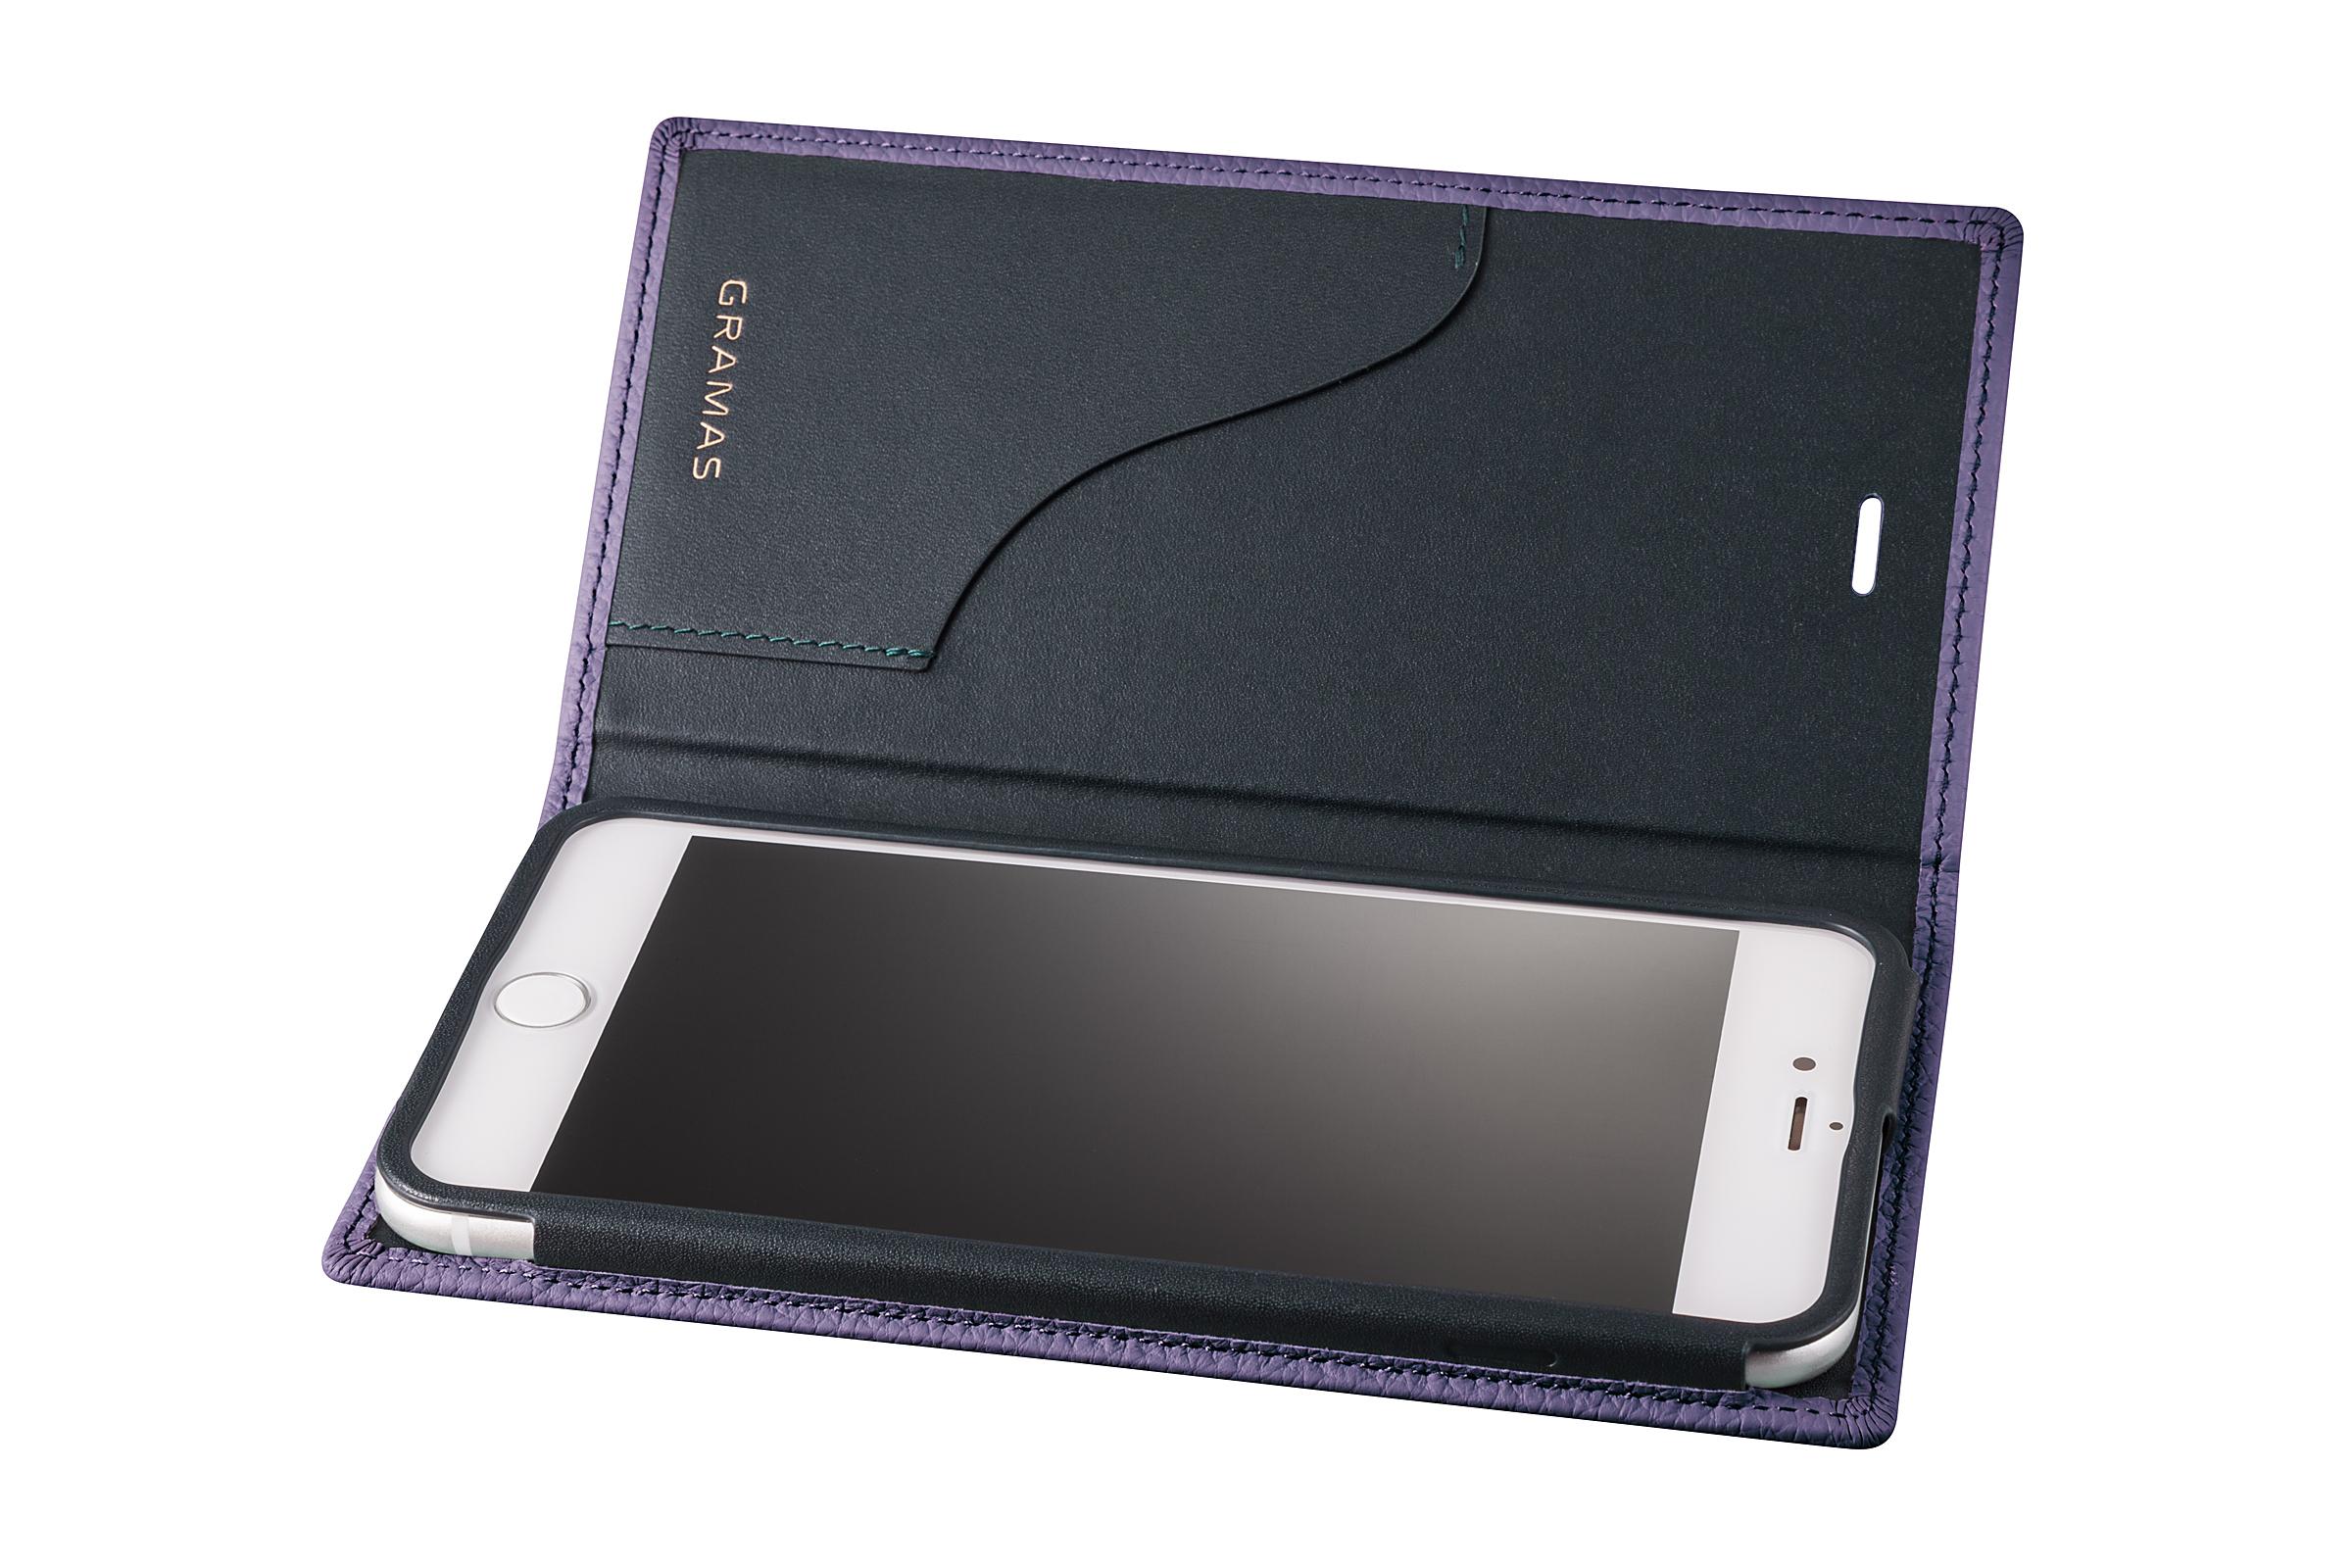 GRAMAS Shrunken-calf Full Leather Case for iPhone 7 Plus(Purple) シュランケンカーフ 手帳型フルレザーケース - 画像3